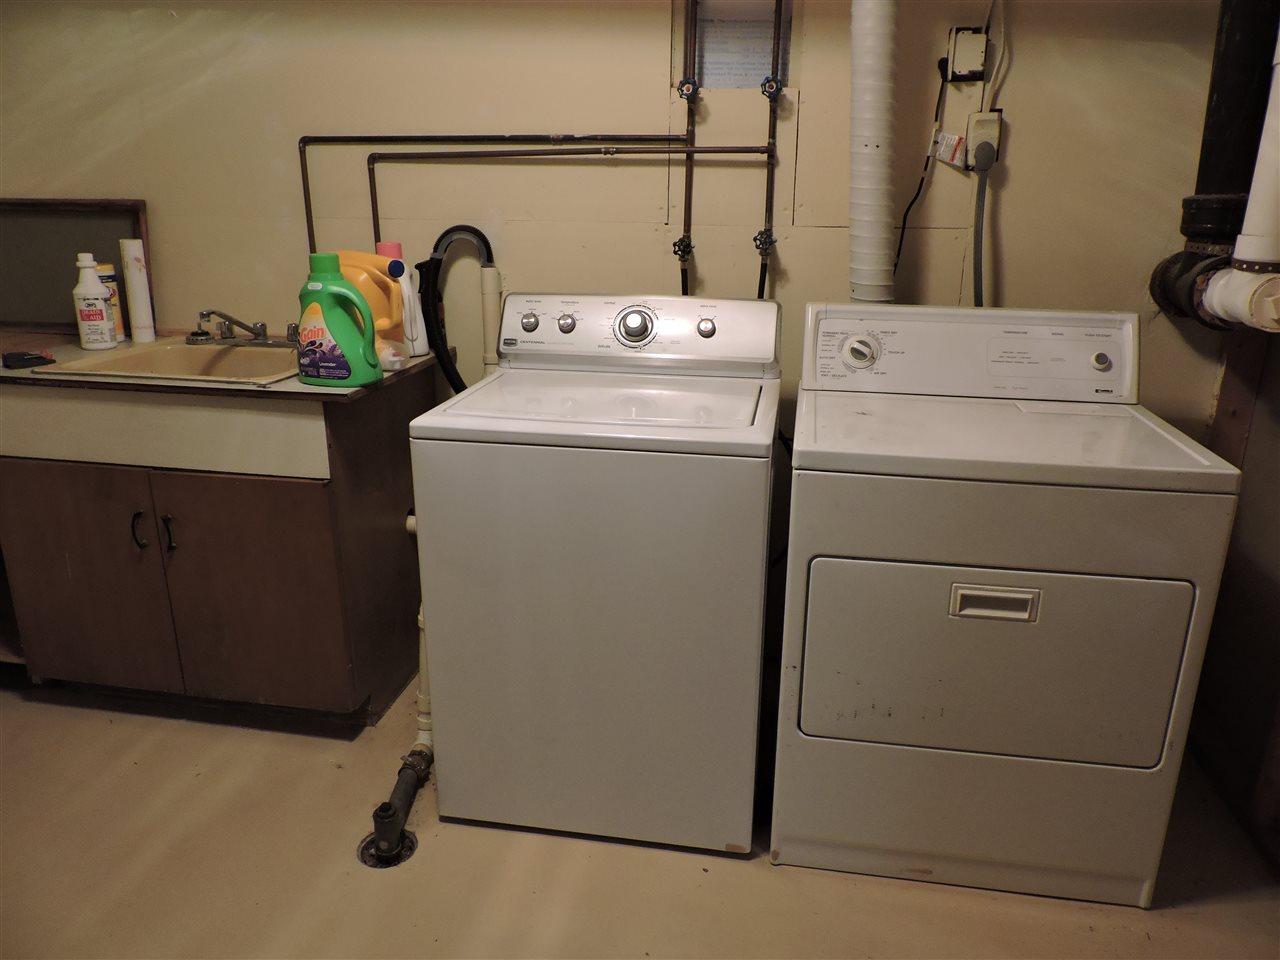 Laundry 12188322